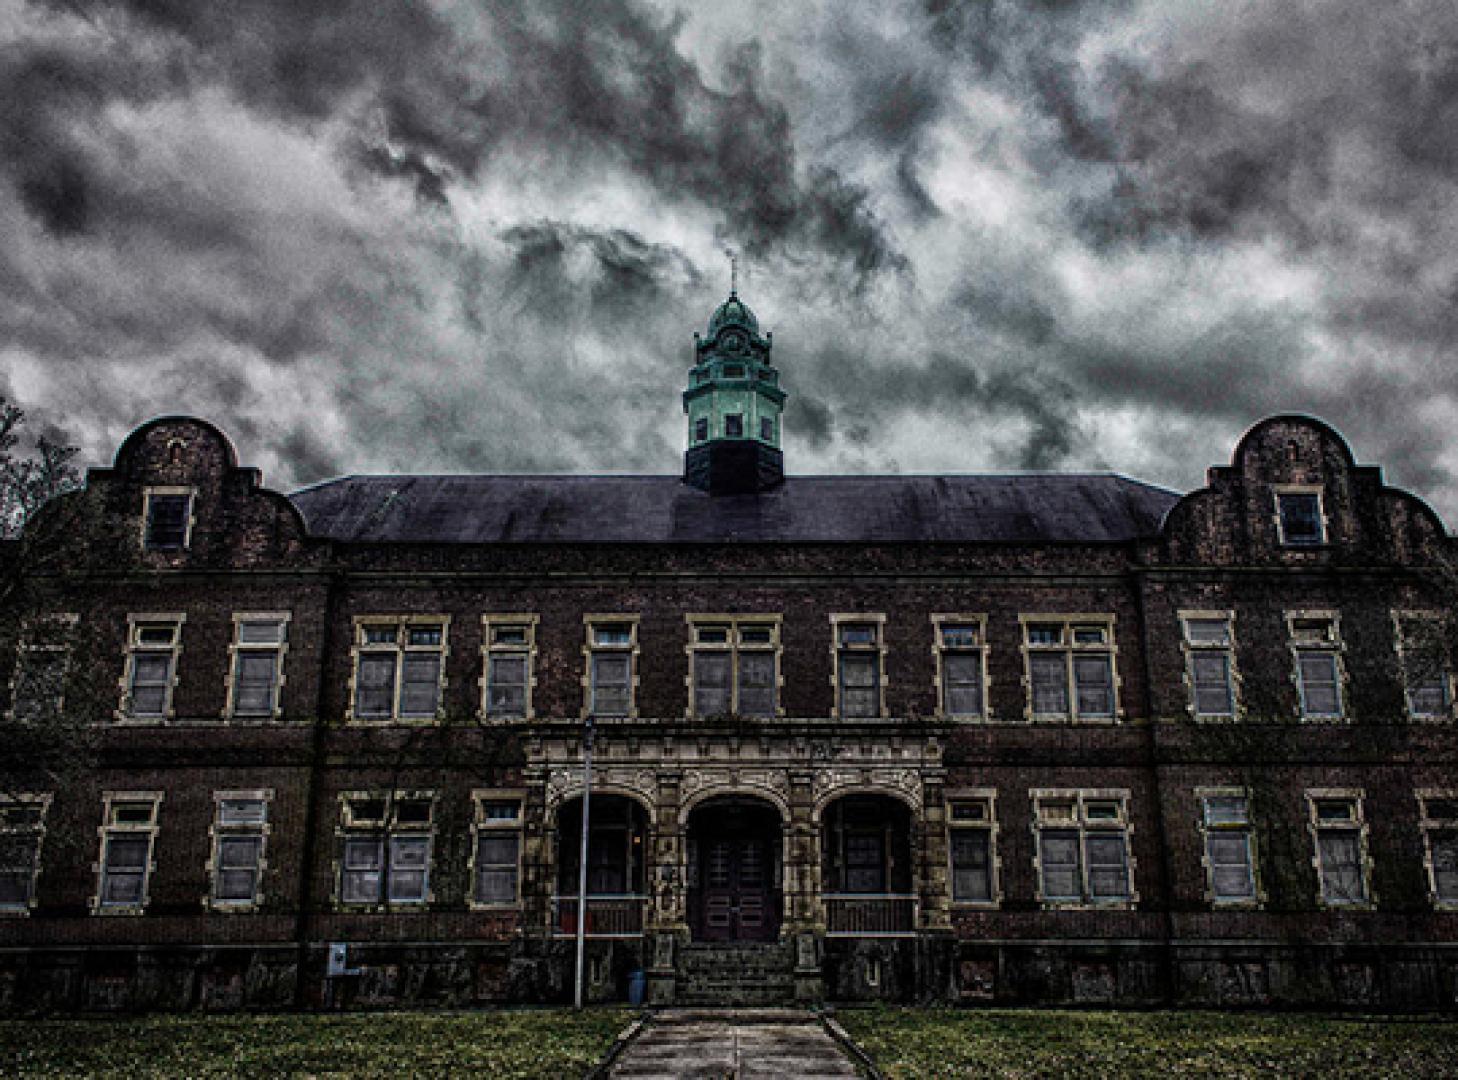 Pennhurst State School and Hospital 1. kép